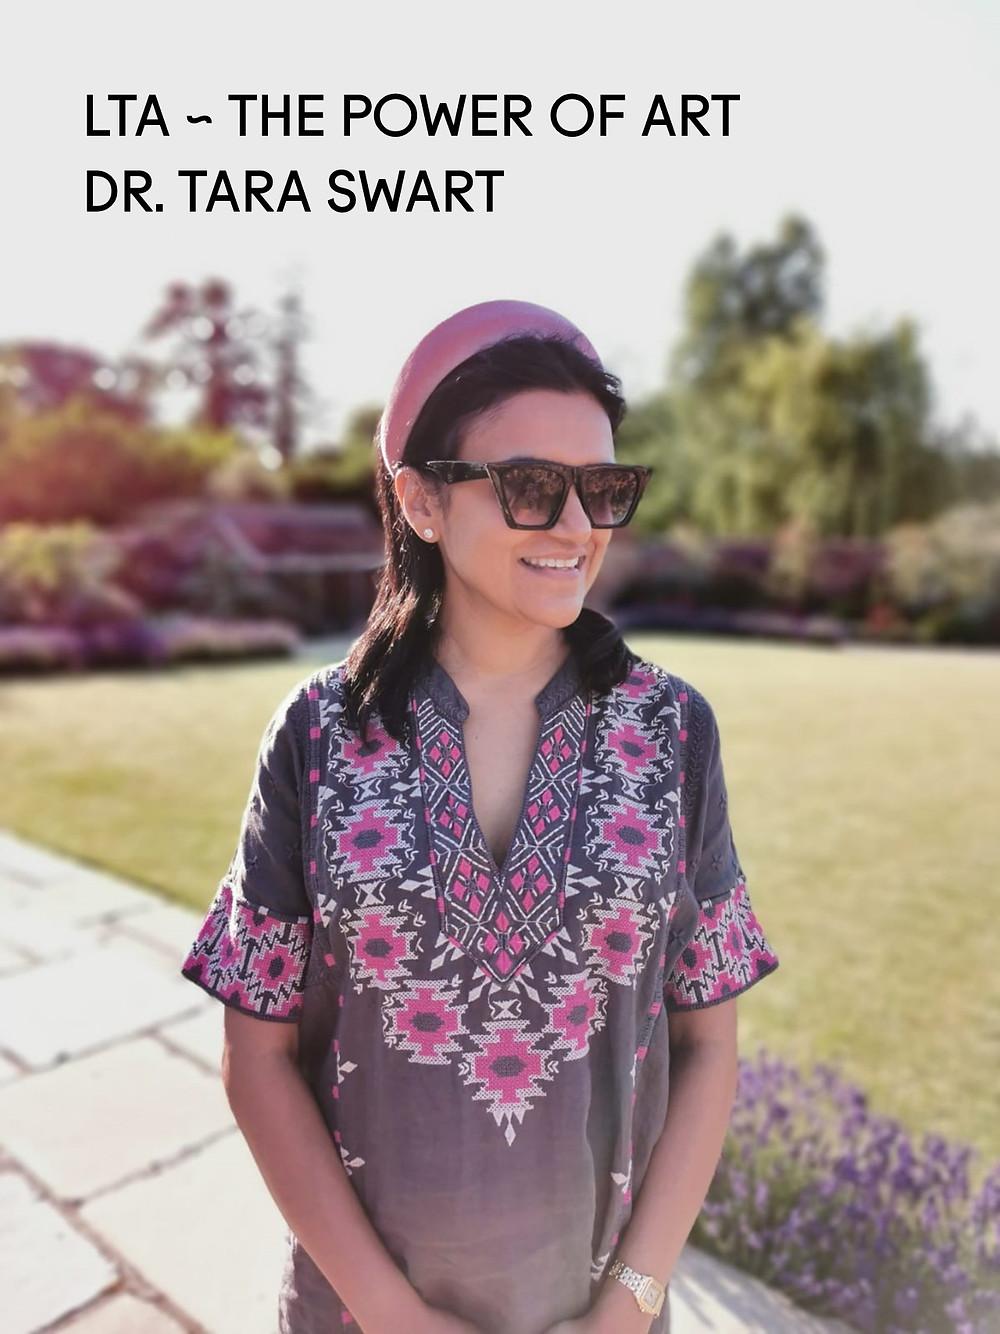 Tara Swart